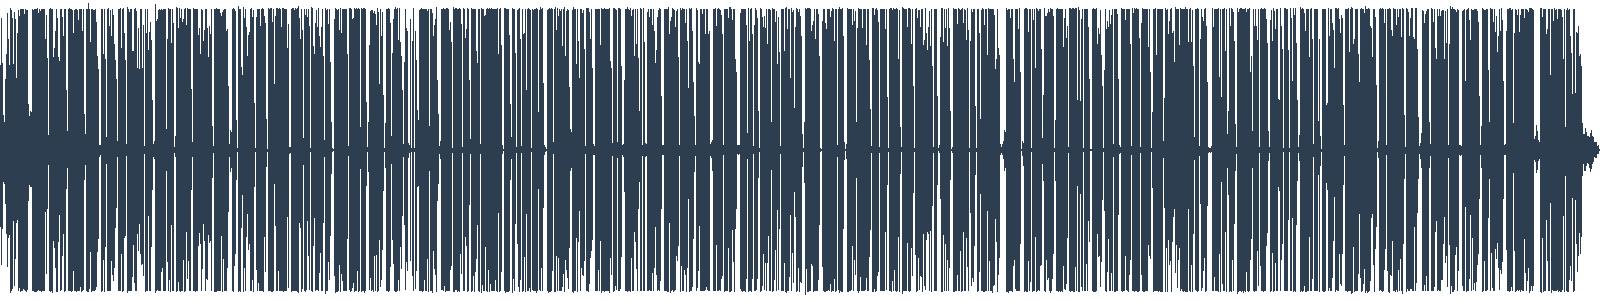 #14 Ivan Krasko a literárna moderna (Maturita s Hashtagom) waveform